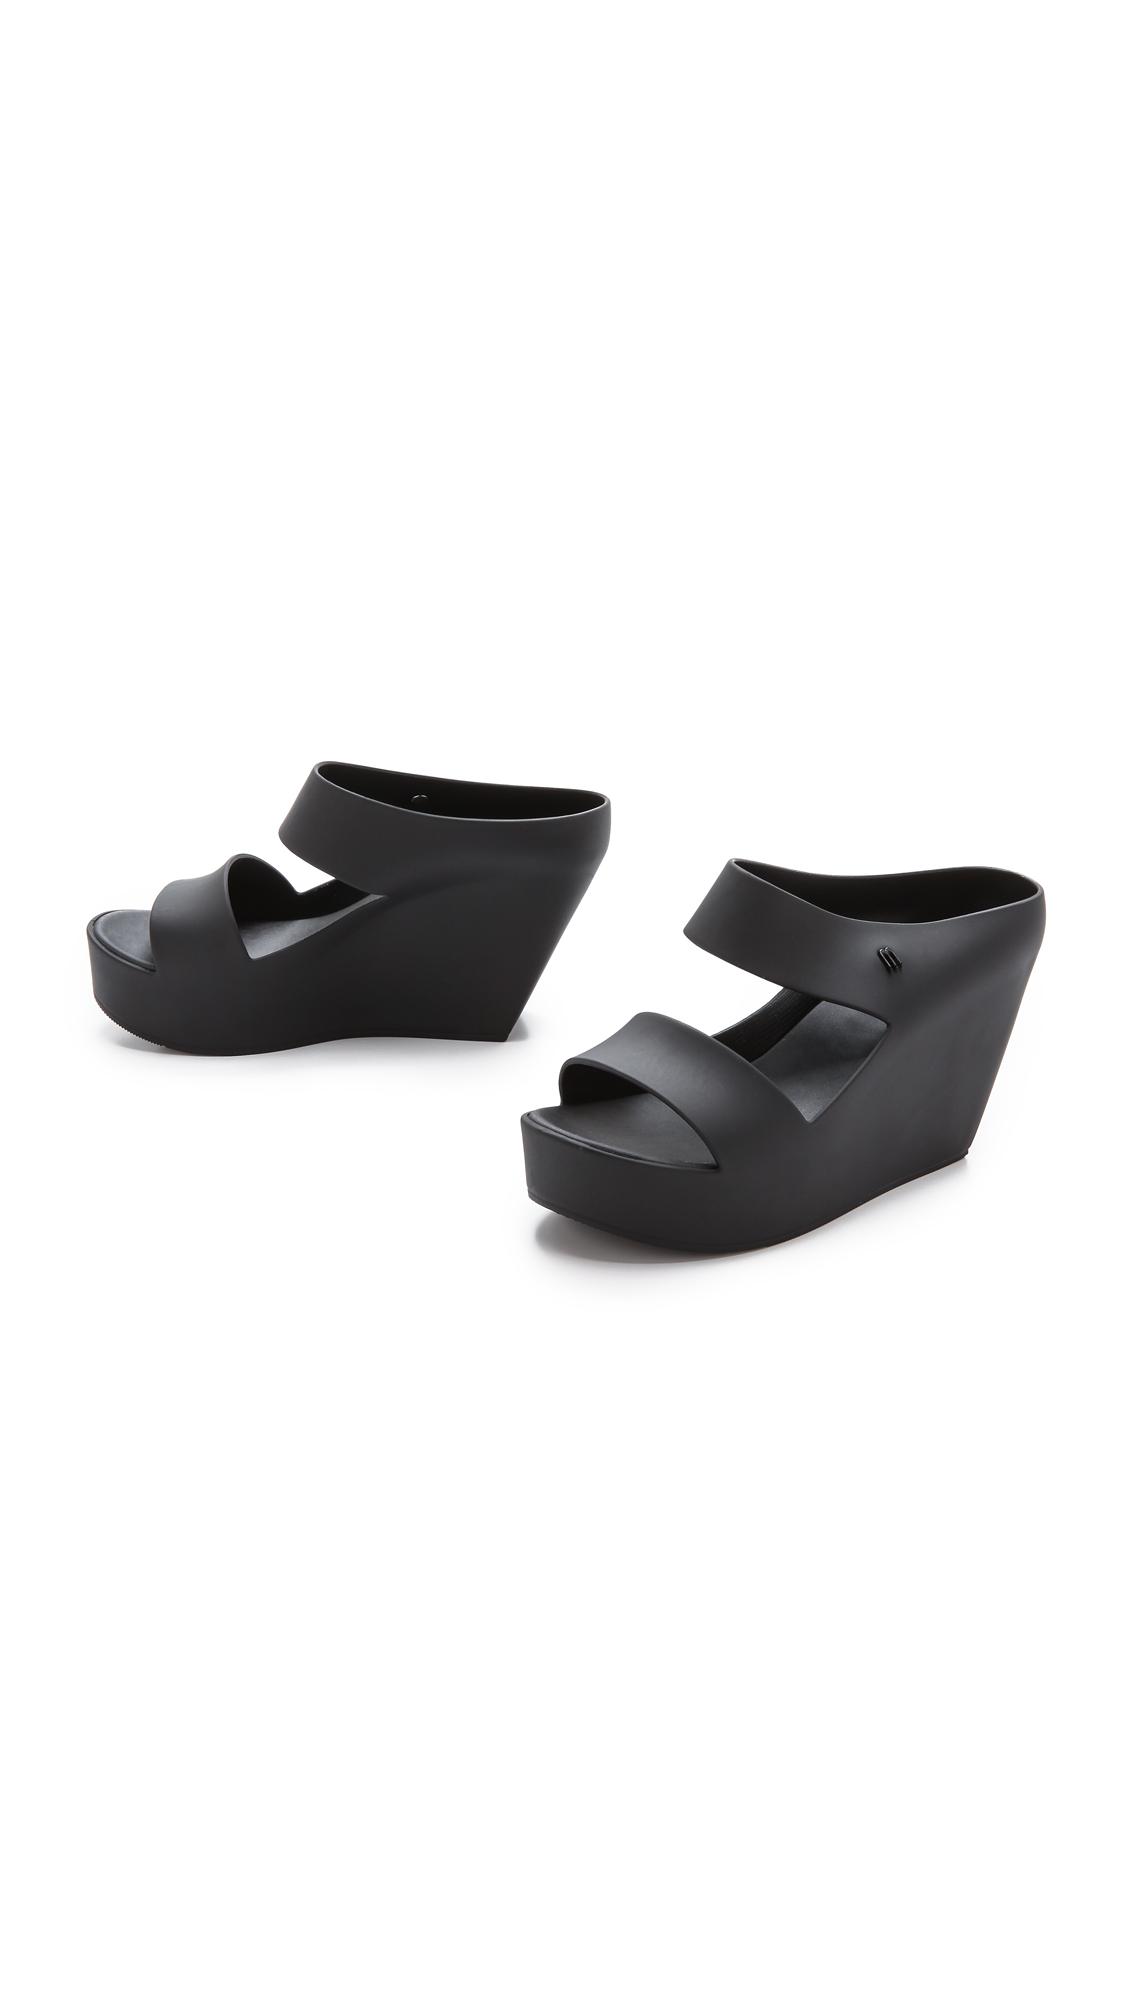 f7659d821b8 Melissa Creative Wedge Sandals